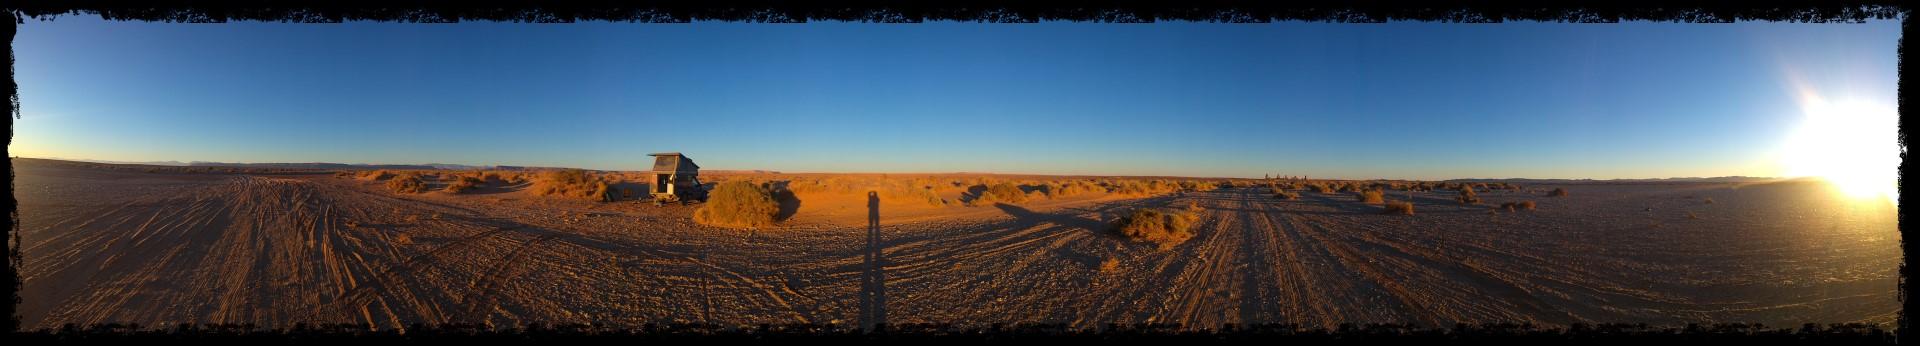 panarama of desert camp